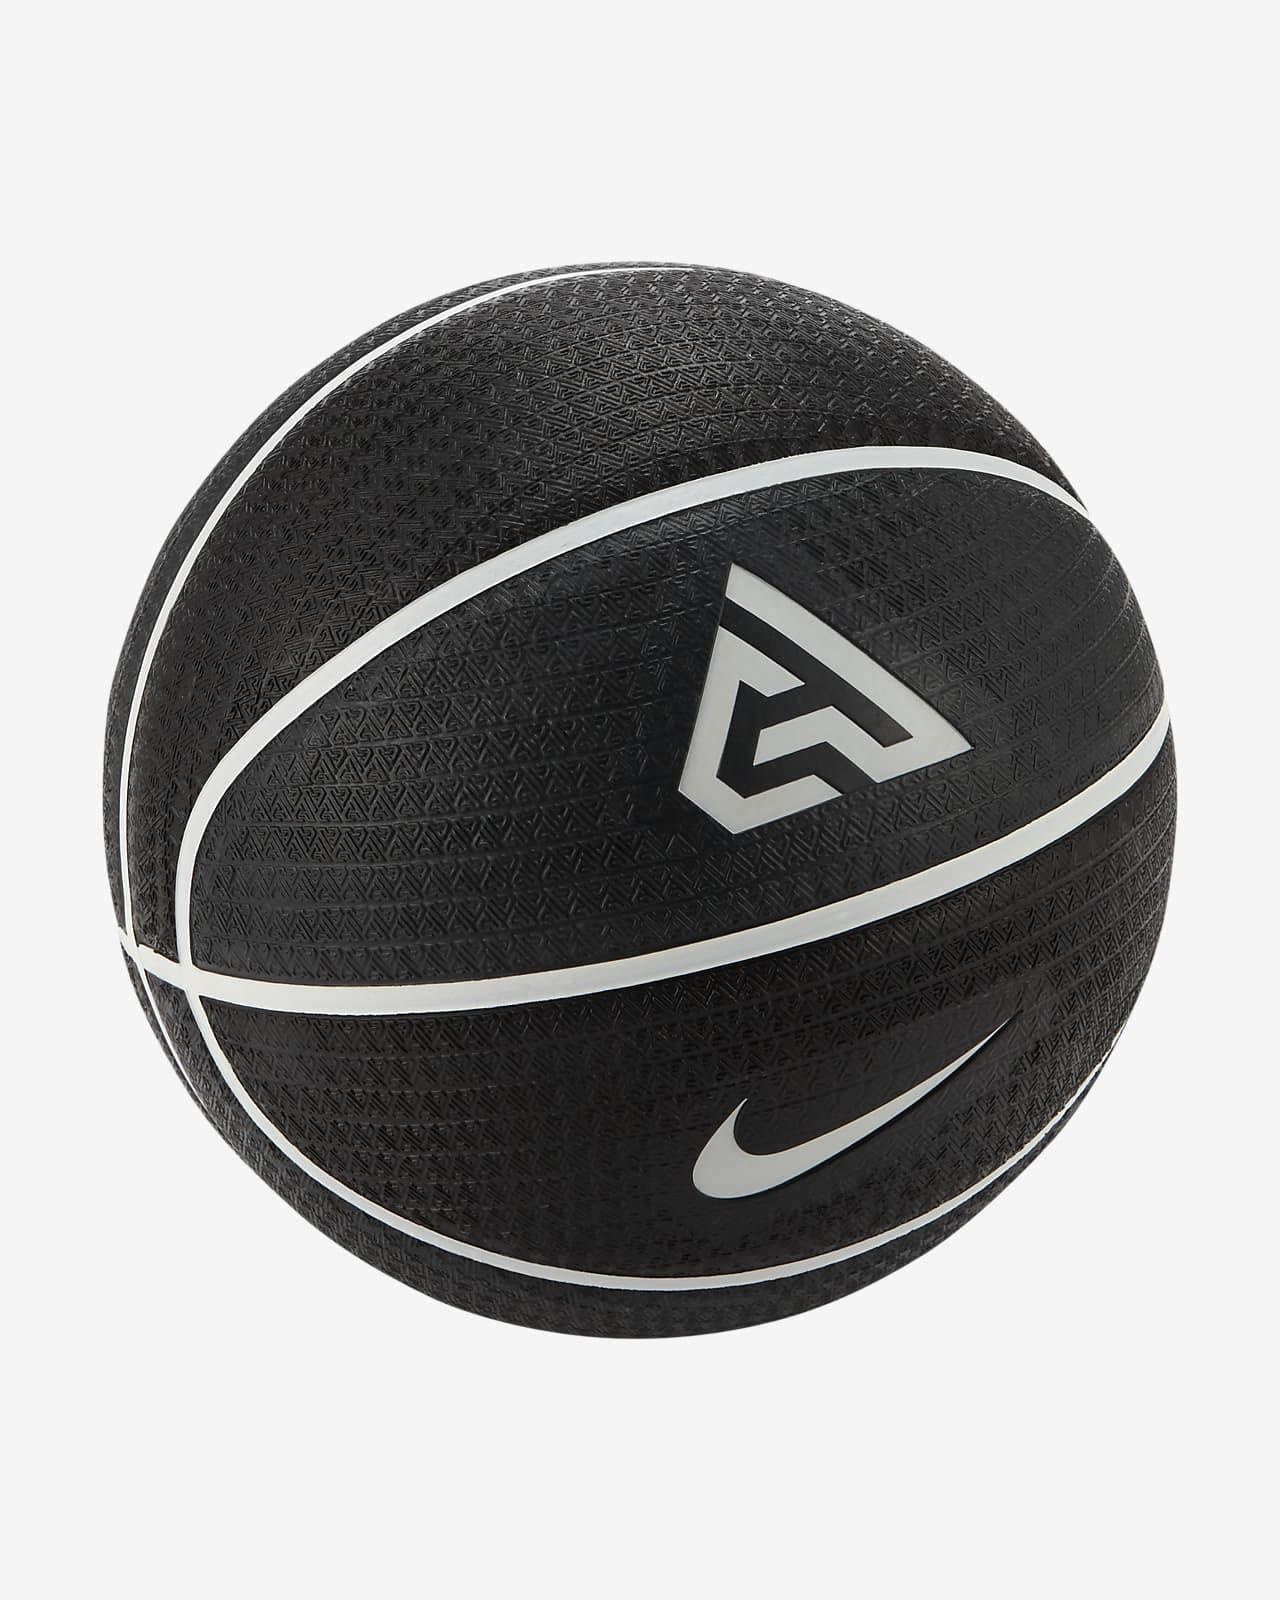 Giannis Playground 8P Basketball